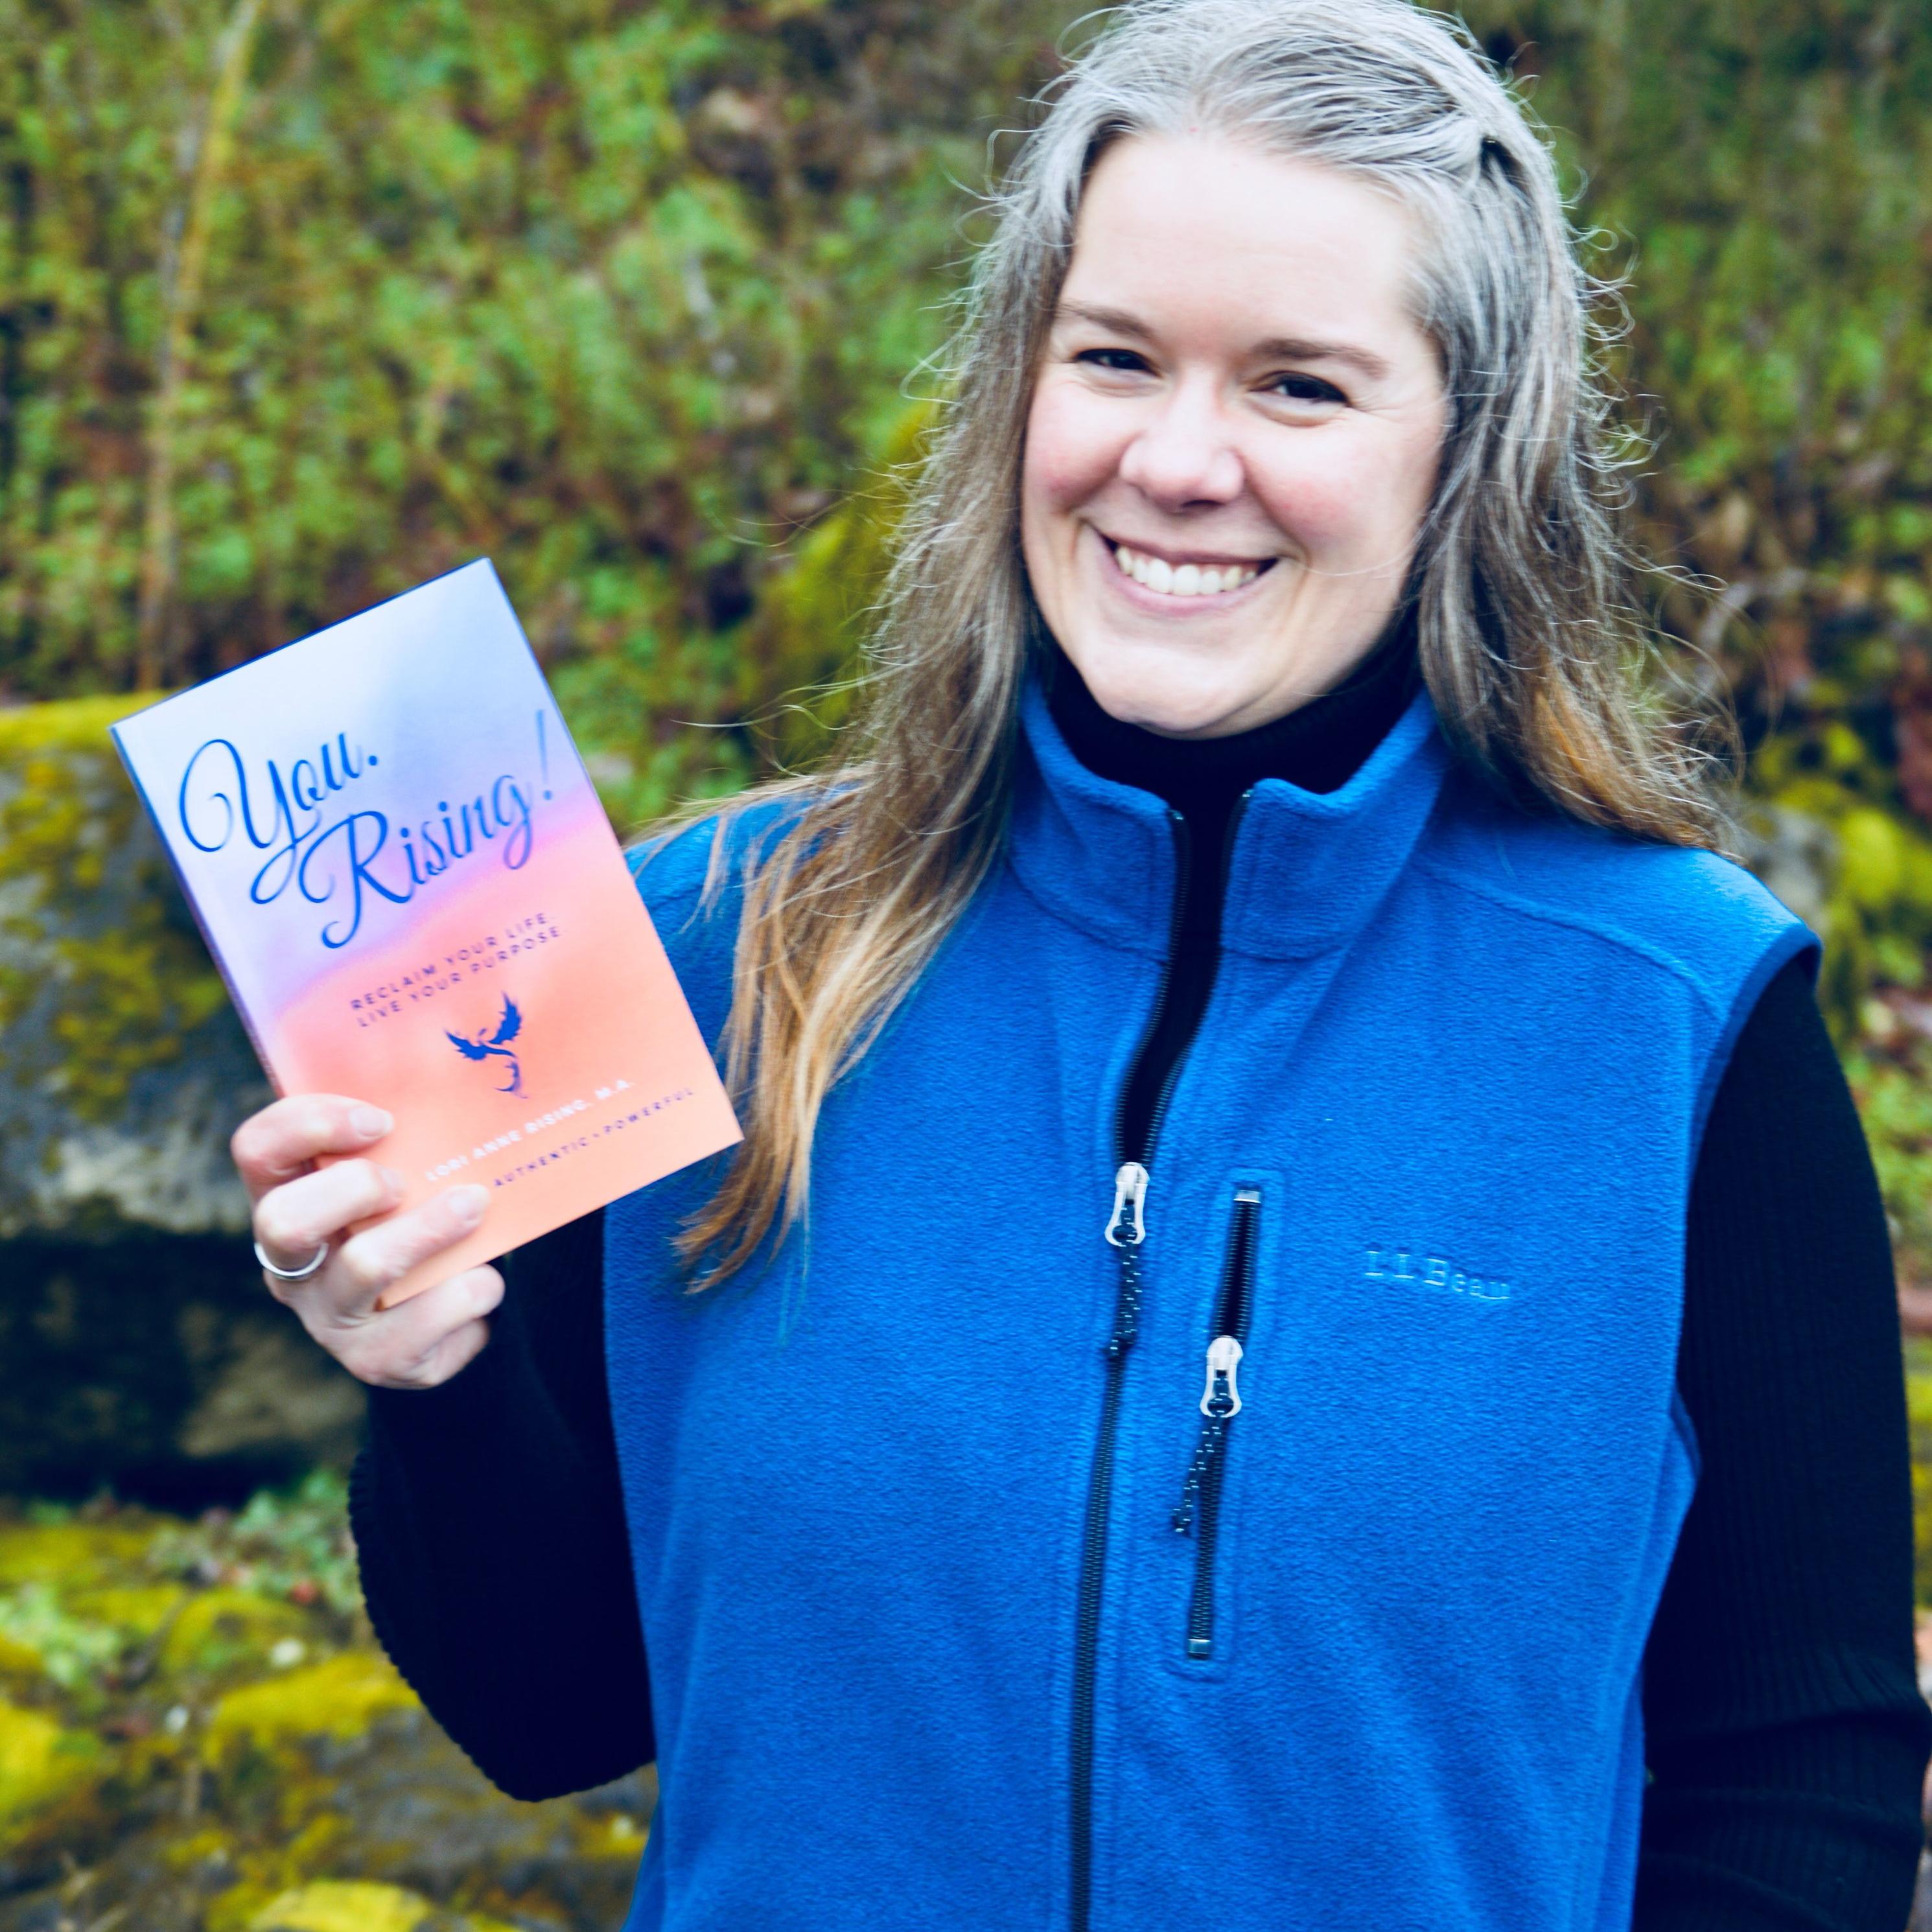 Lori Anne Rising | The Women's Information Network